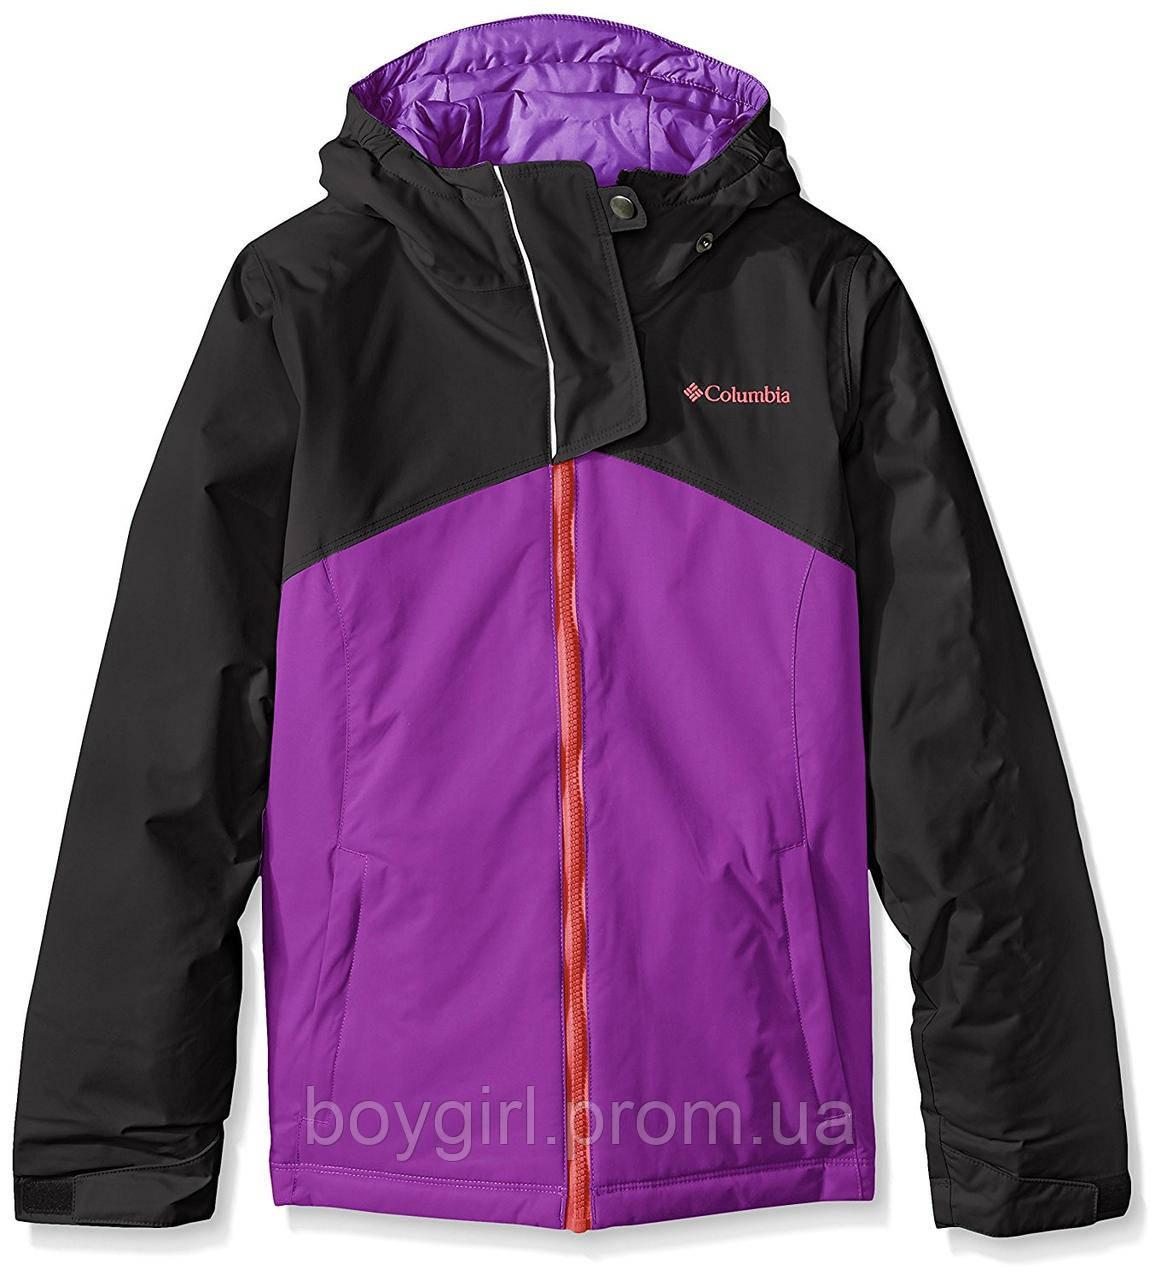 5a1d142f3b63 Зимняя куртка Columbia с системой роста - Интернет-магазин